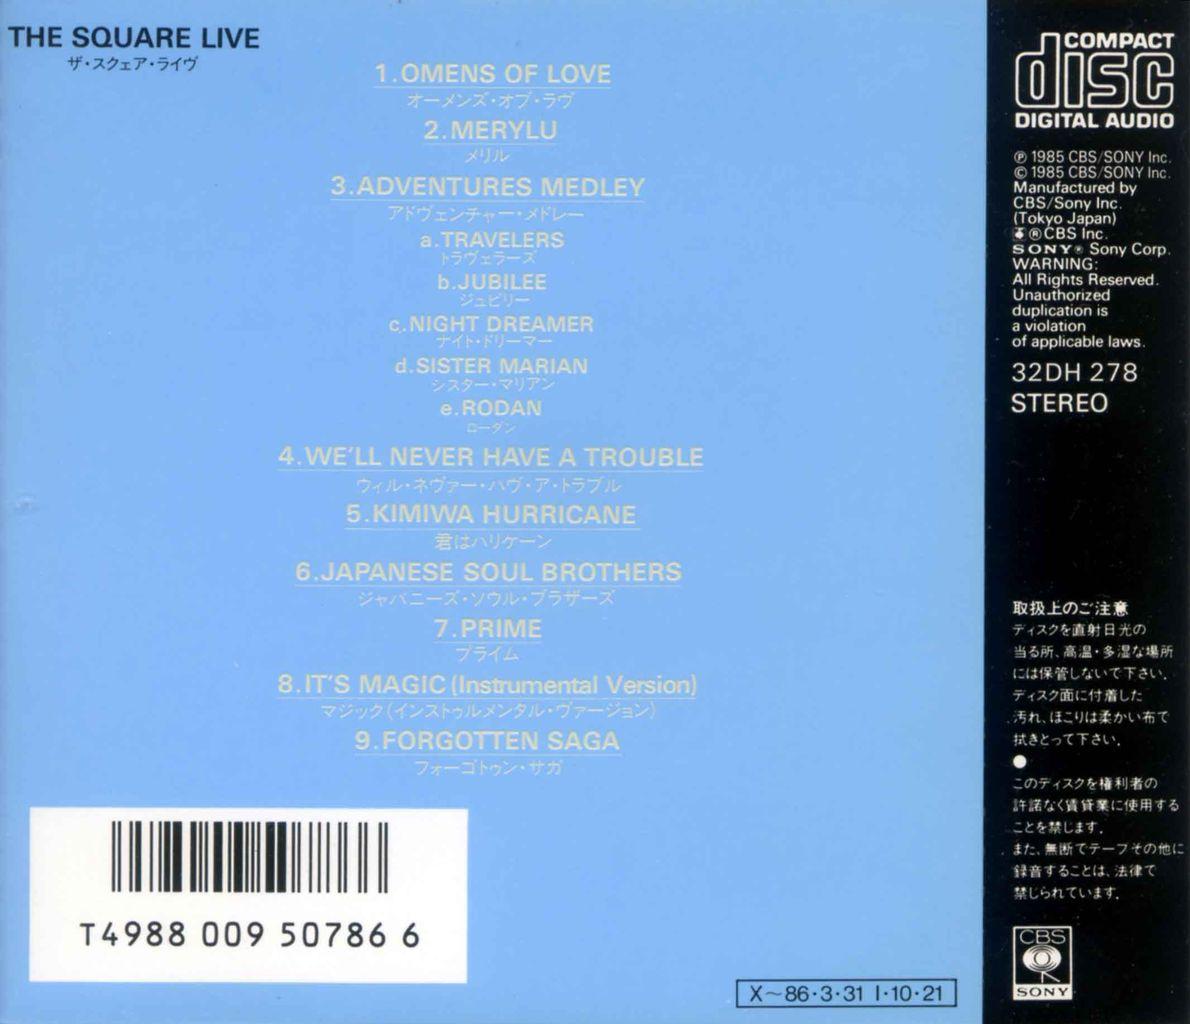 THE SQUARE LIVE-2